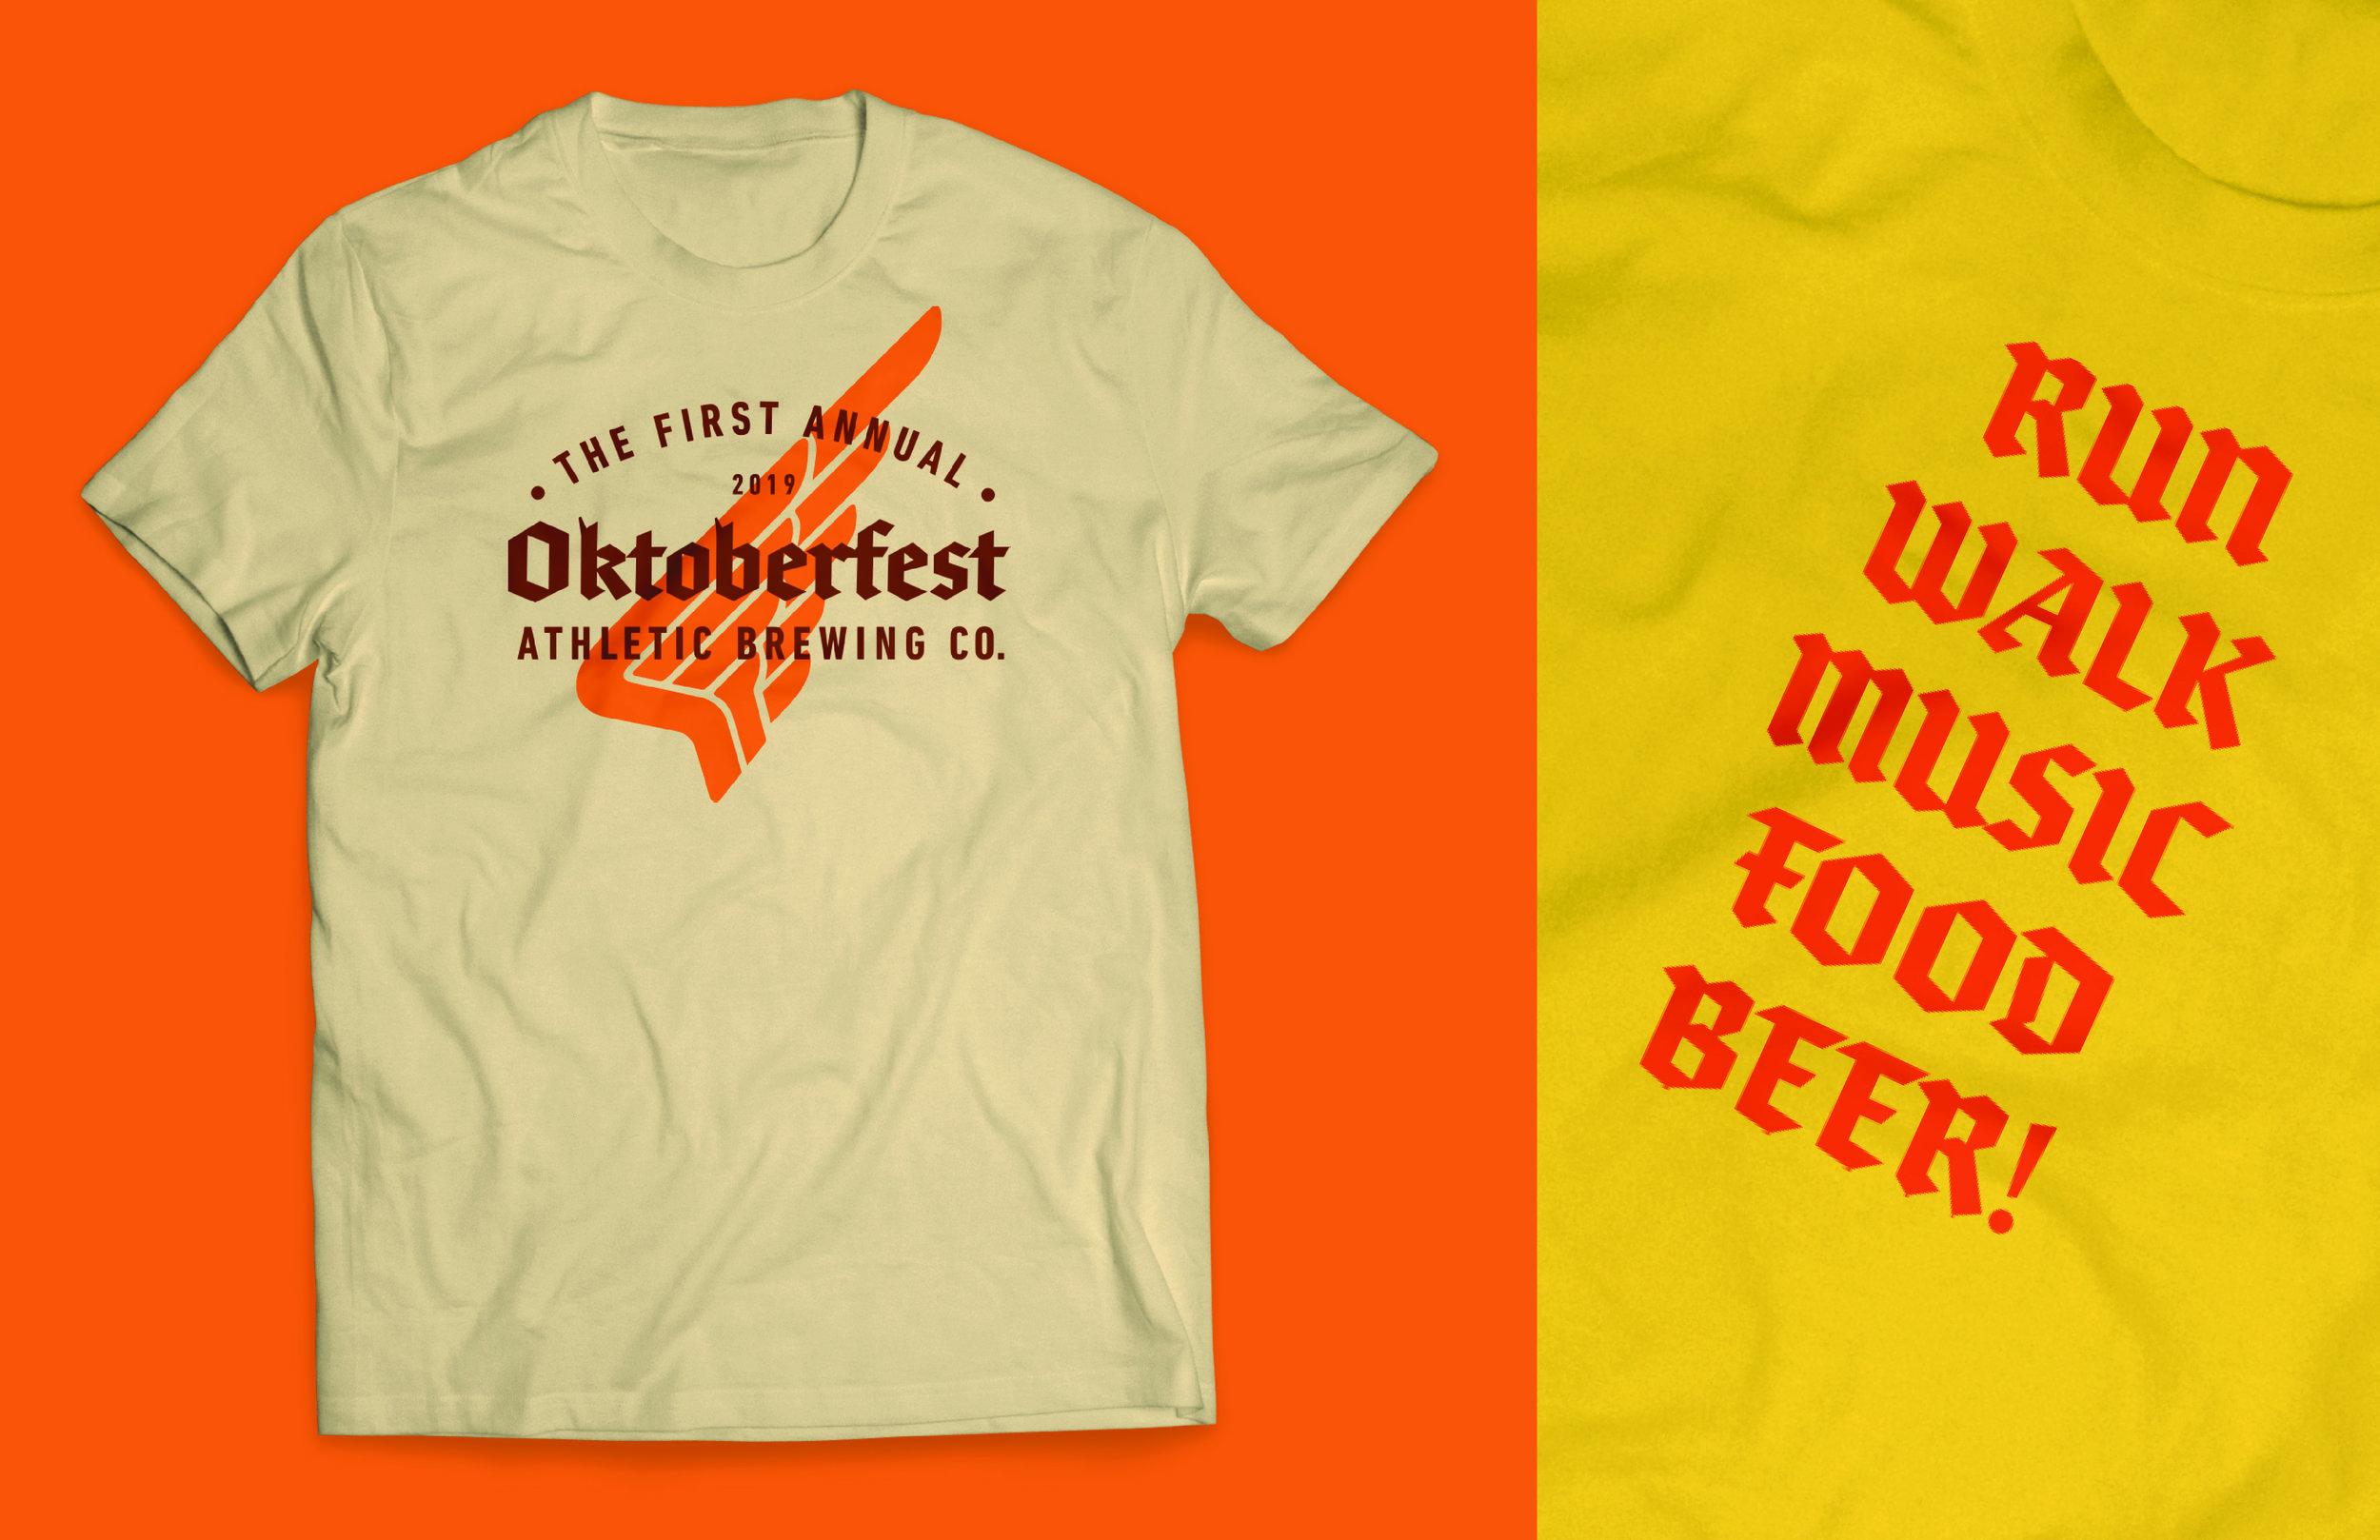 ABC_Oktoberfest_Graphic-03.jpg